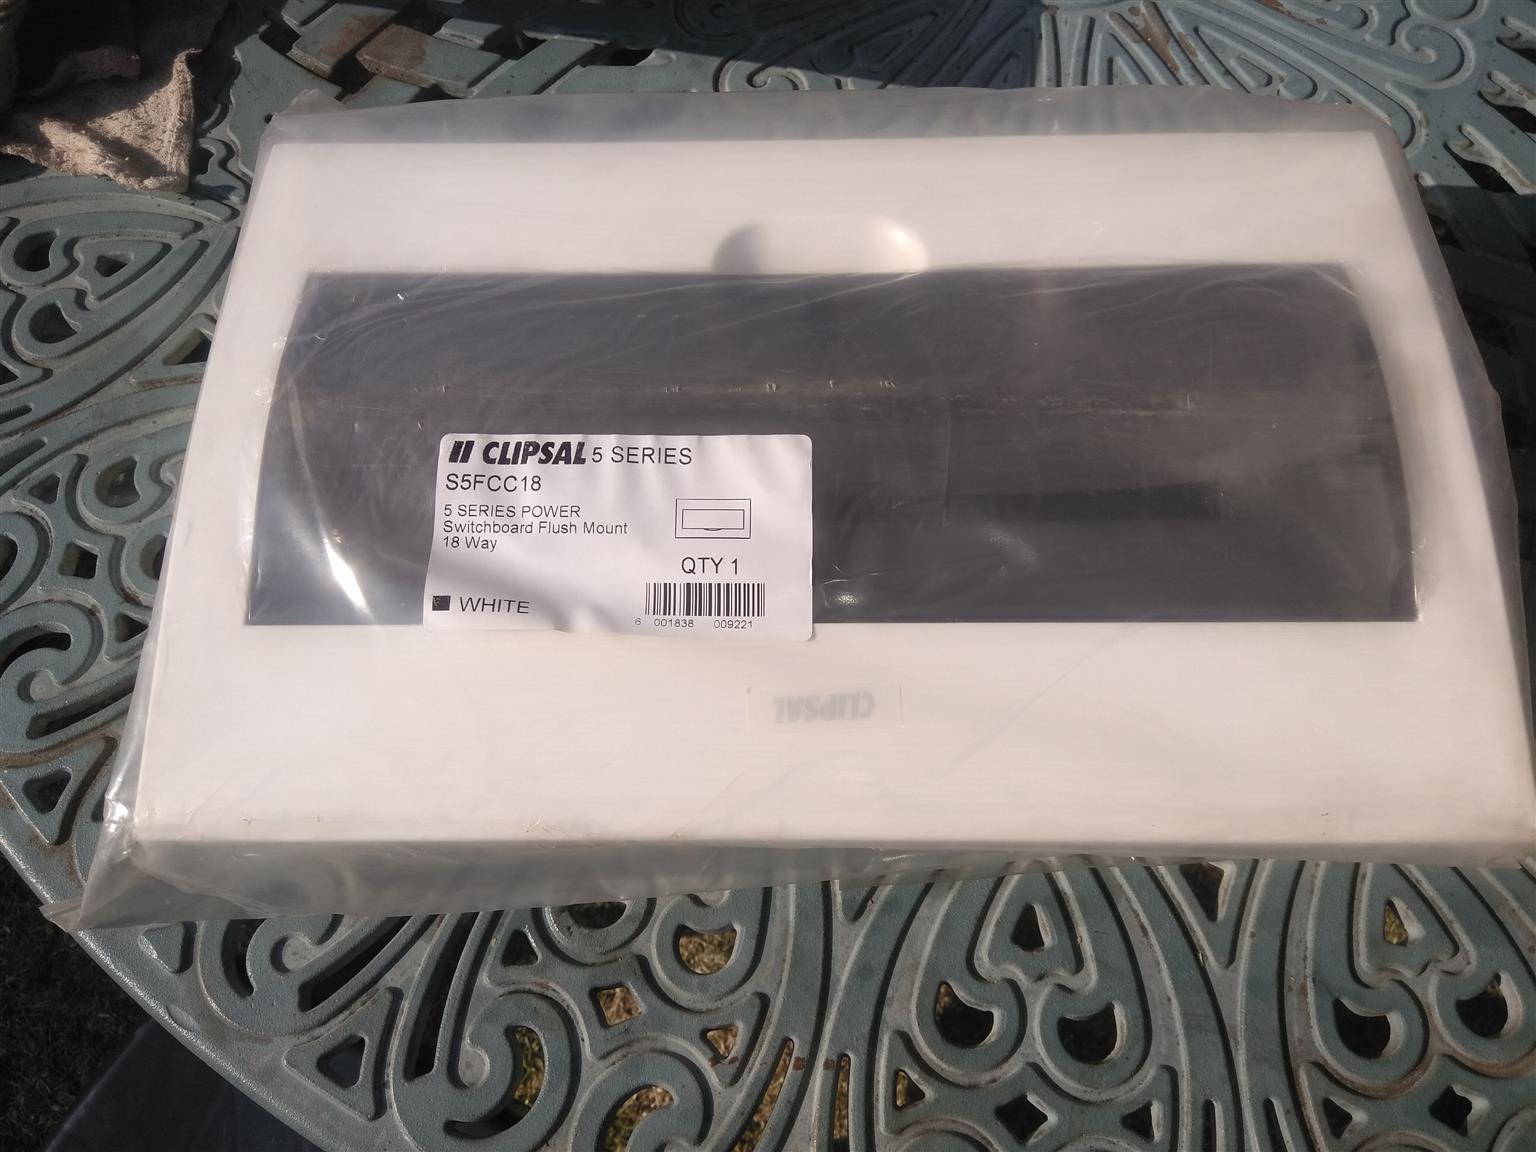 Clipsal S5FCC18 5 Series Power Switchboard Flush Mount 18 Way